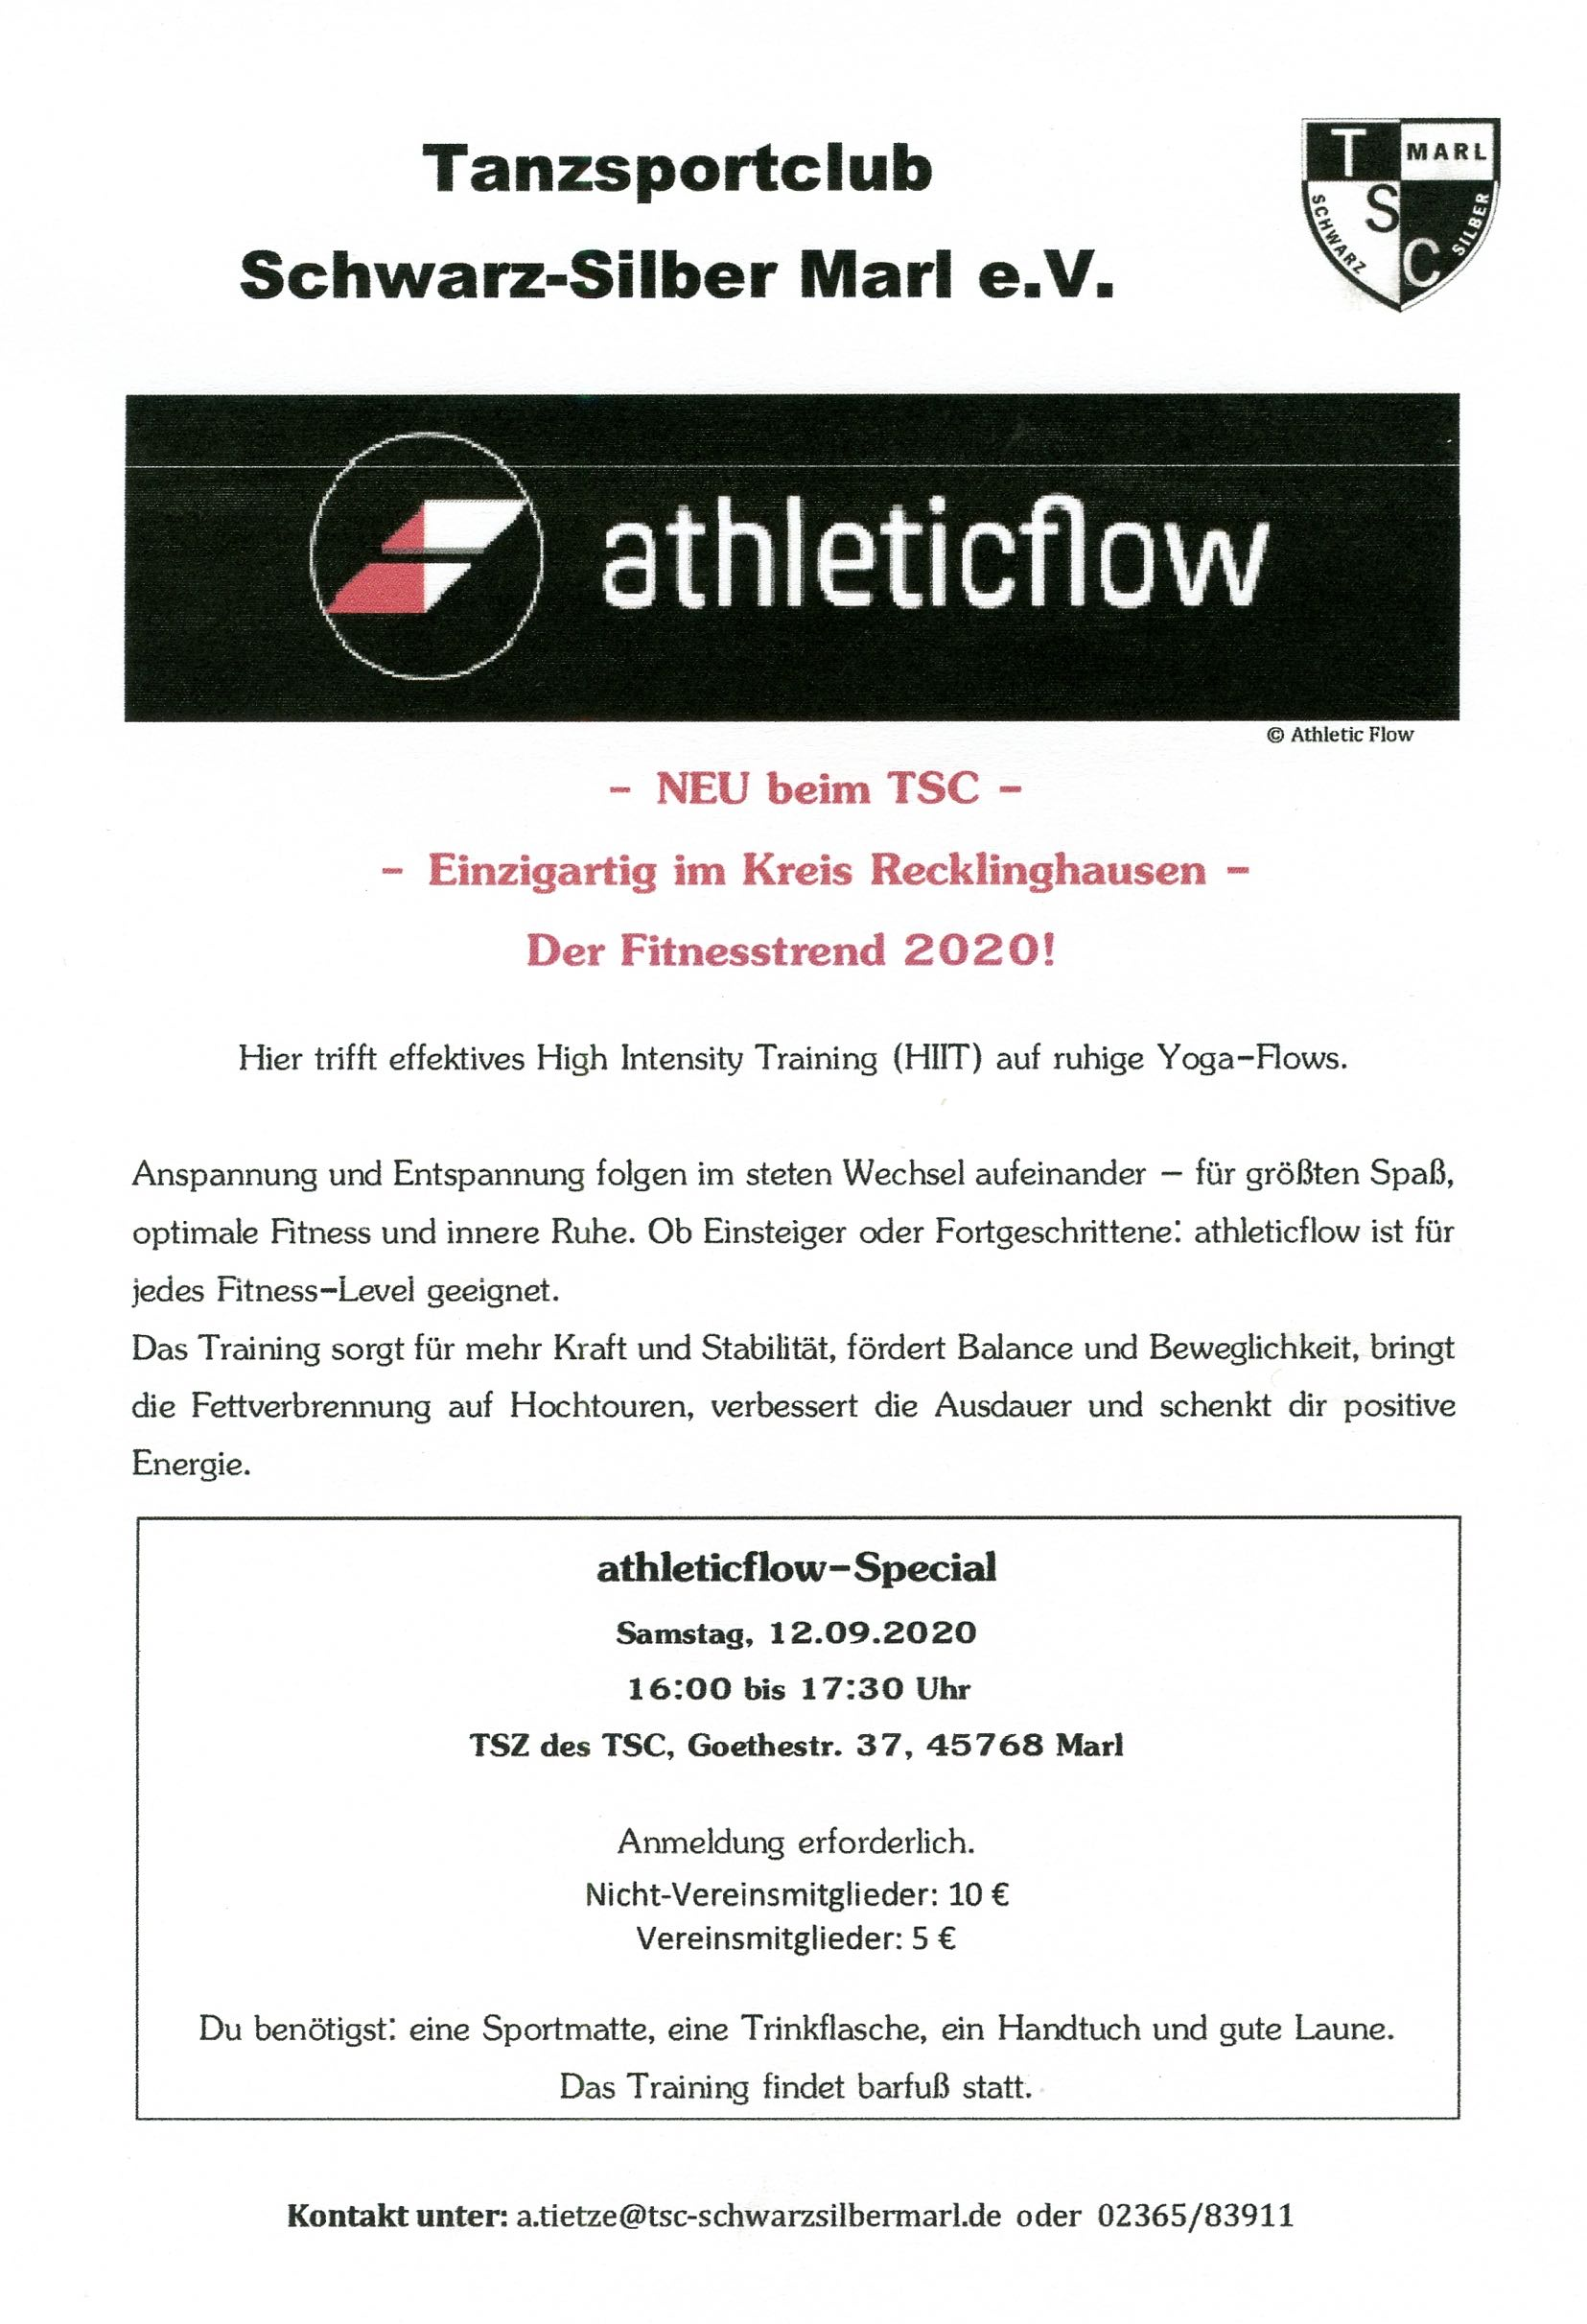 12.09.2020 - Workshop athleticflow™